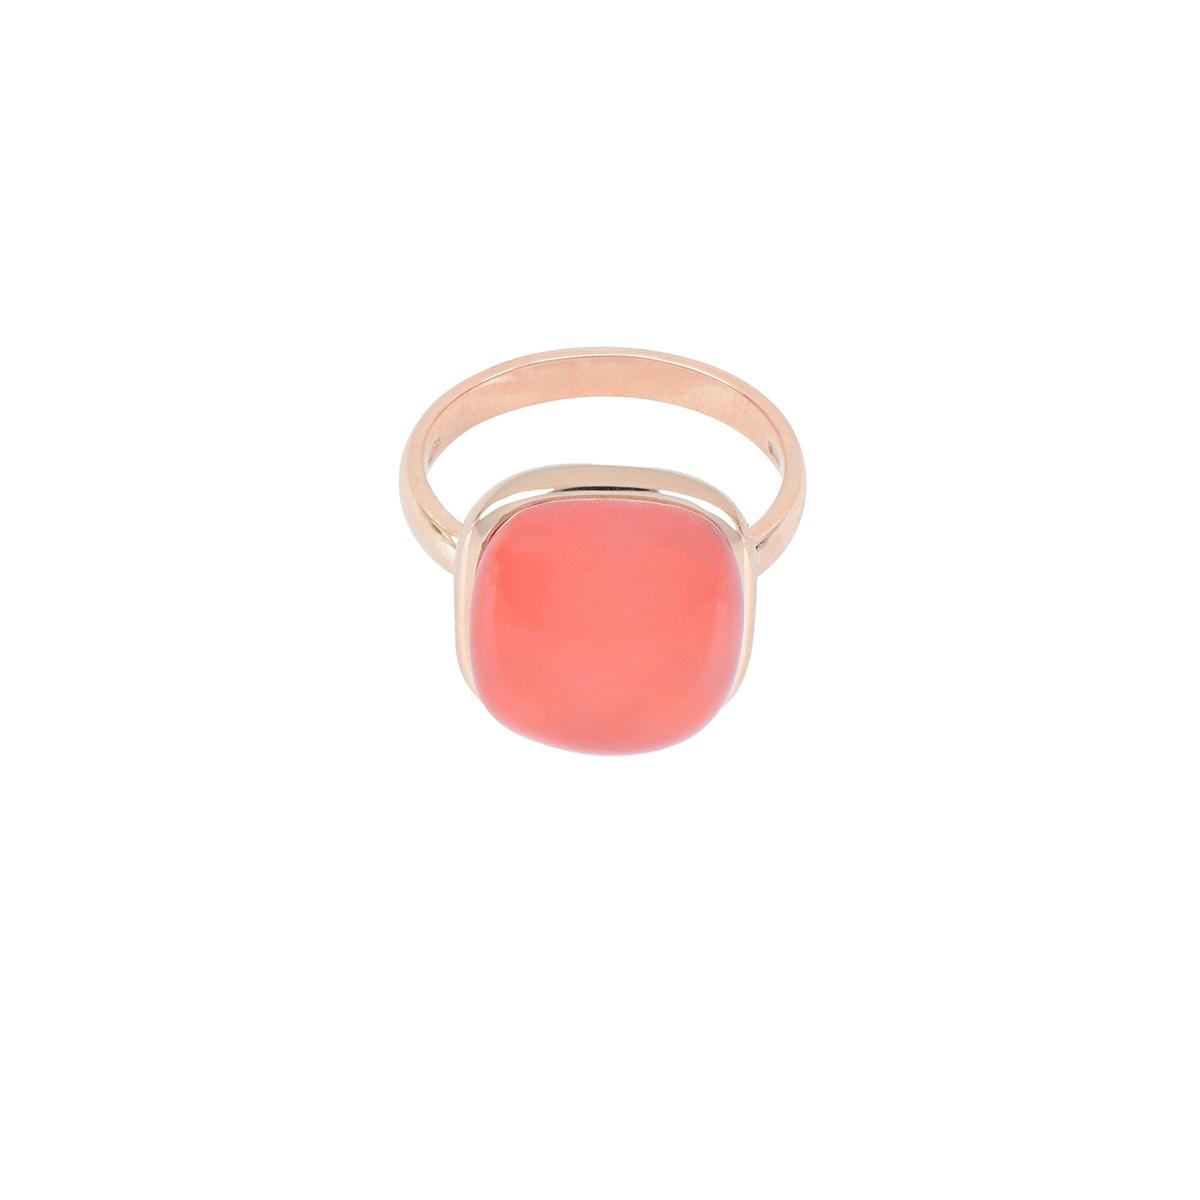 Cabochon Cut Quartz And Carnelian Ring